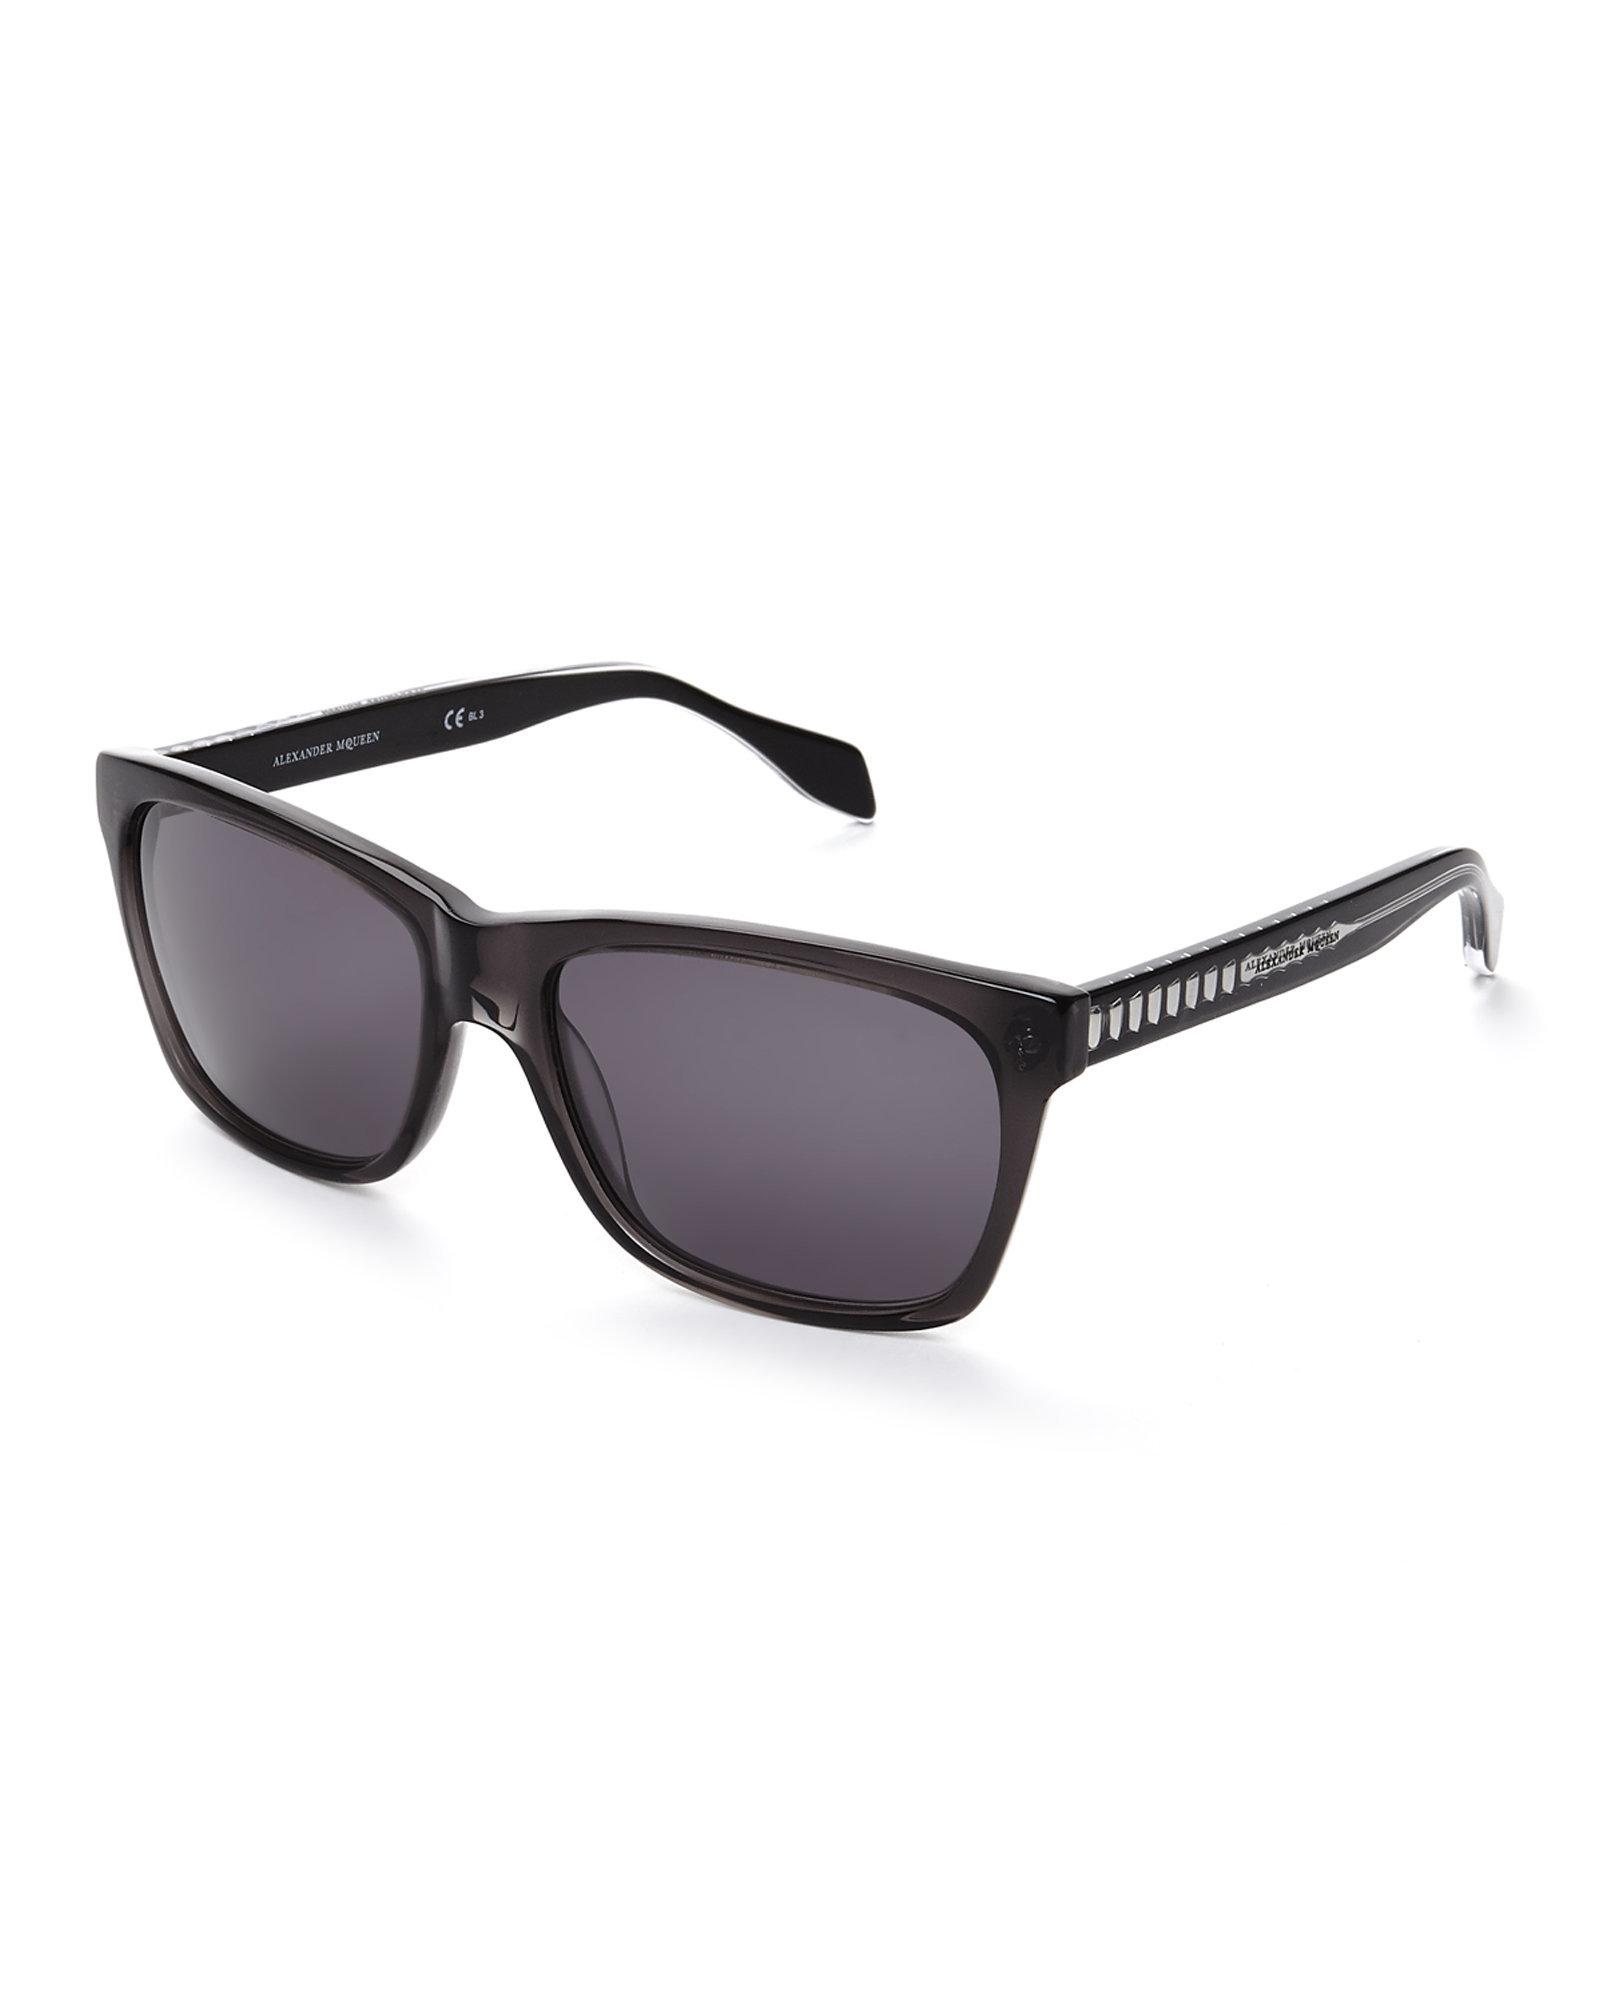 696ab9b079 Lyst - Alexander McQueen Black Amq 4253 Wayfarer Sunglasses in Black